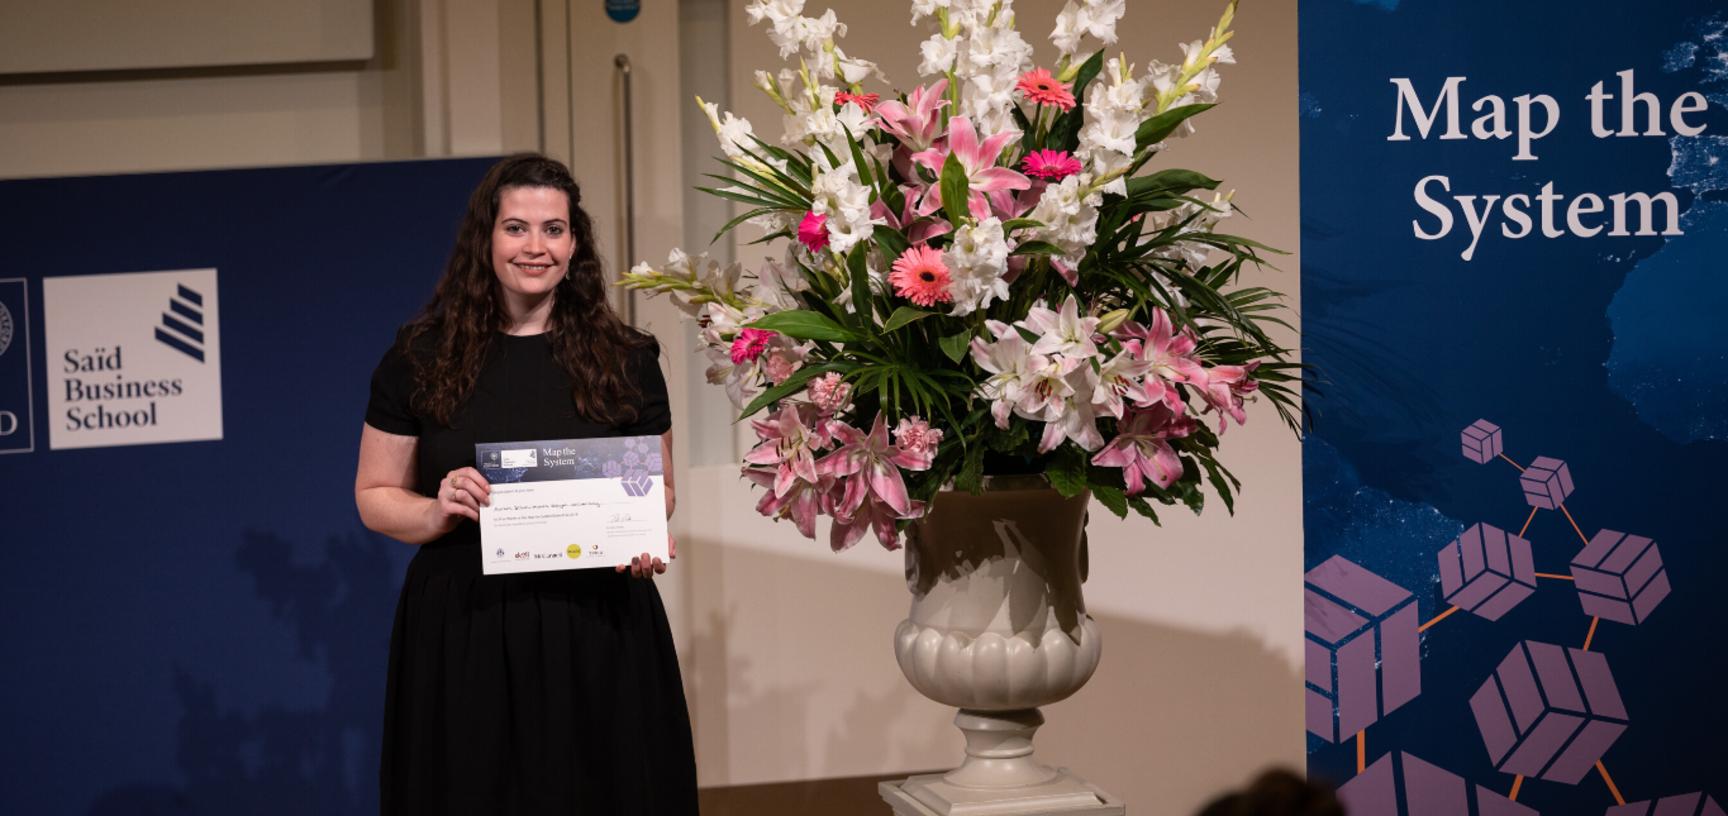 Roisin Dillon, Mount Royal University, holding Map the System 2018 Prize award